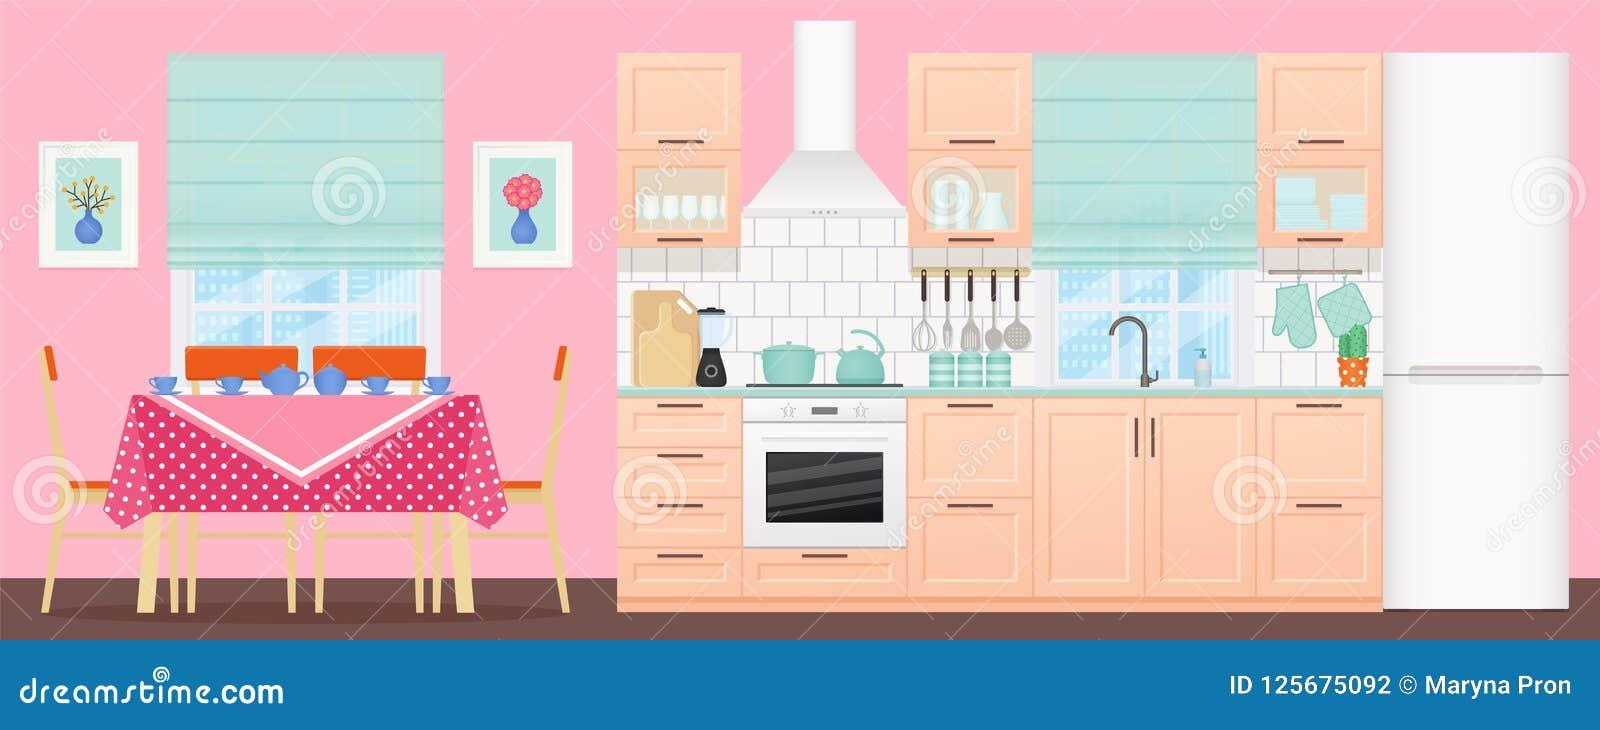 Kitchen Interior With Dining Area Vector Illustration Flat Design